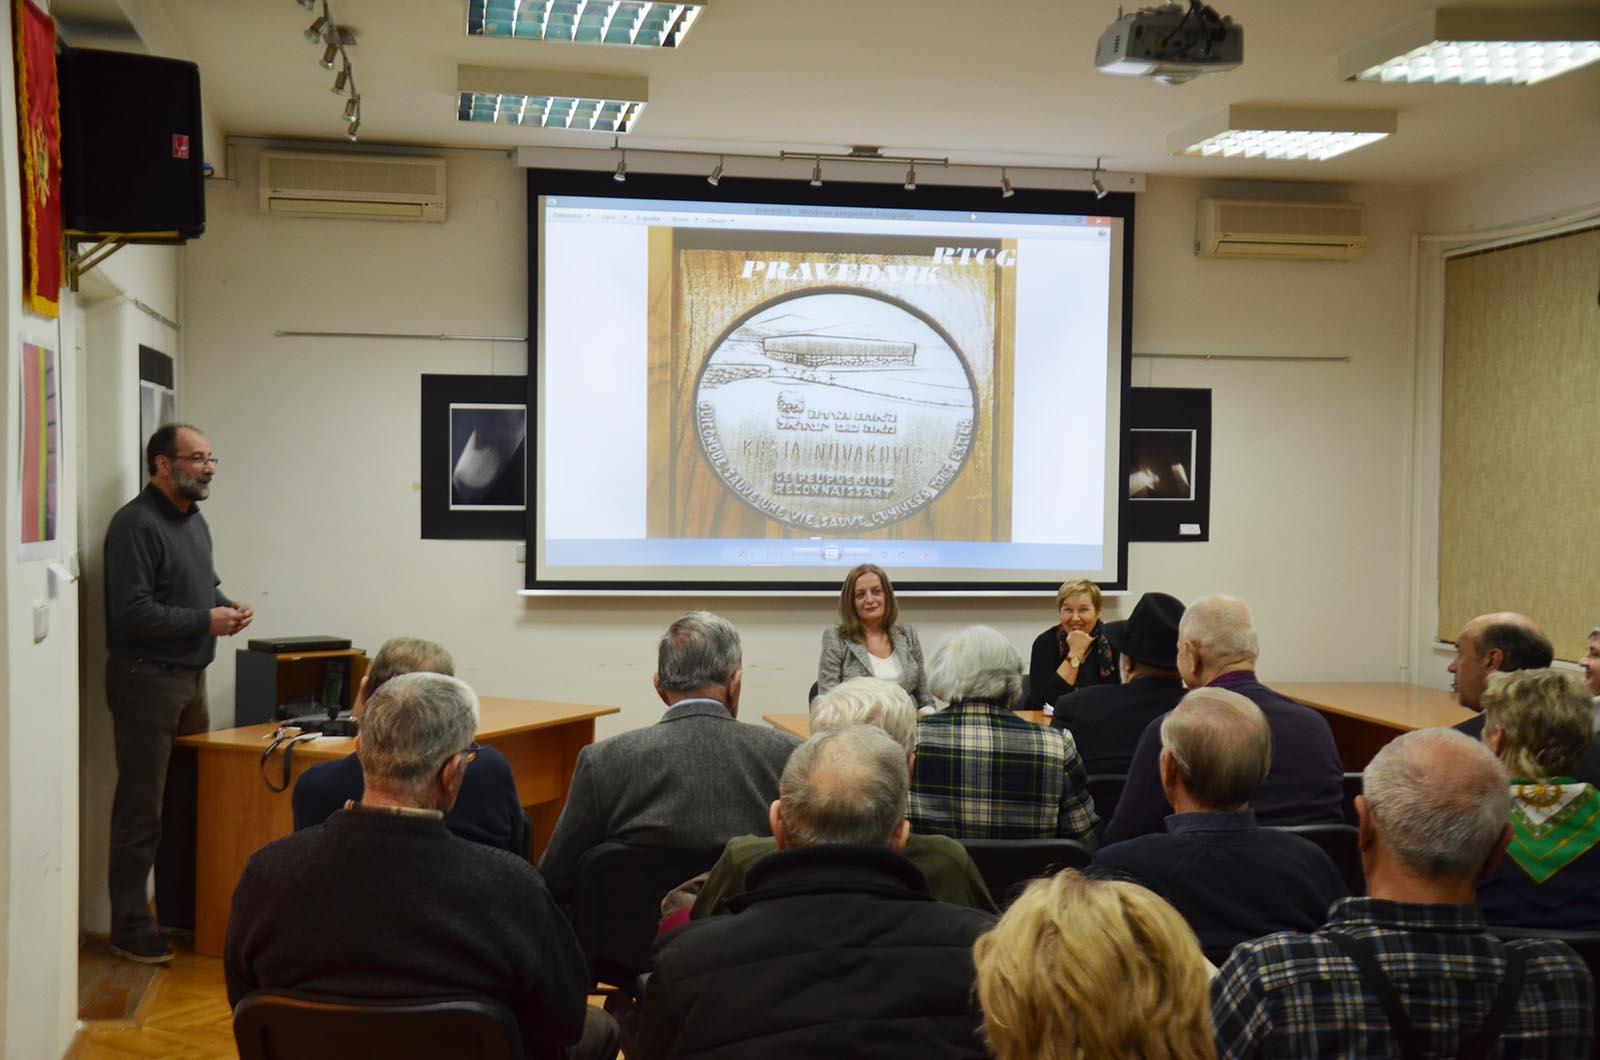 Projekcija Filma U Klubu Crnogoraca 3 3